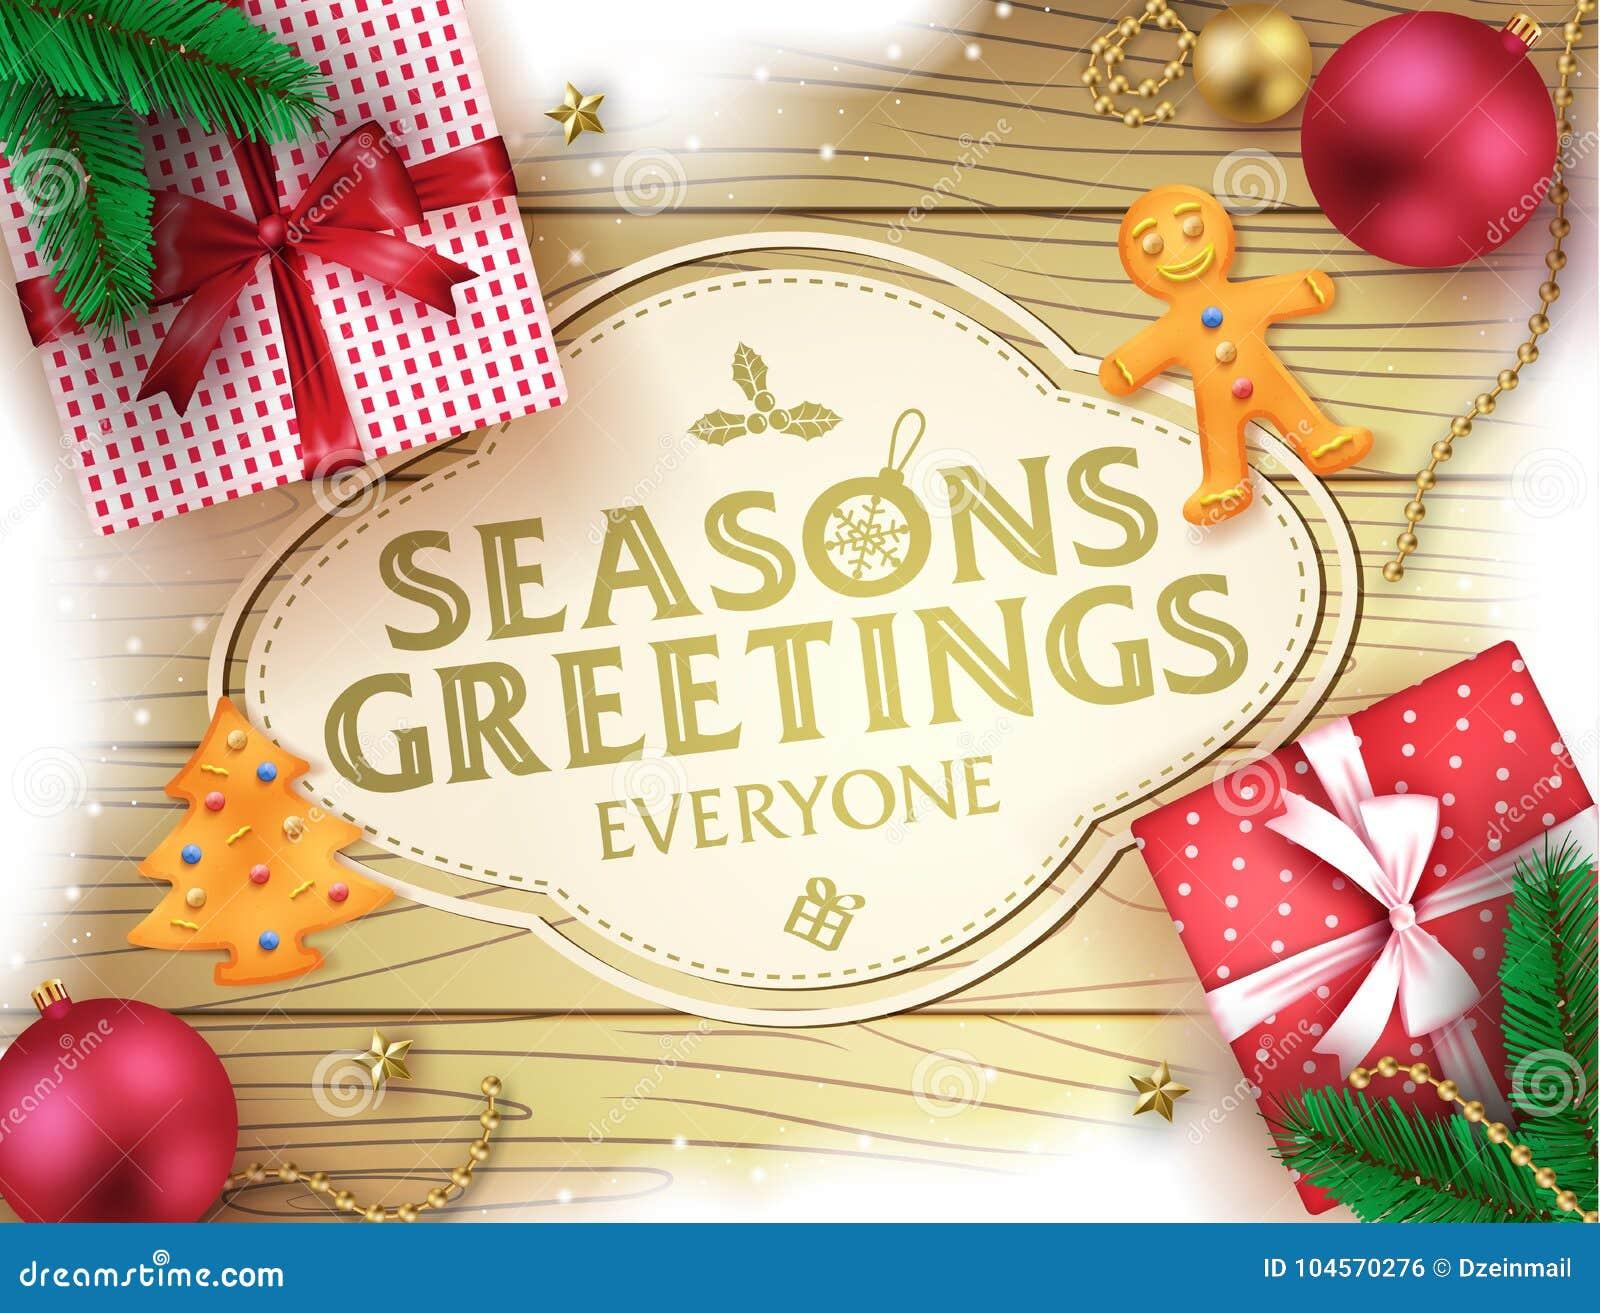 Christmas Seasons Greetings Decorative Greeting Poster In Brown